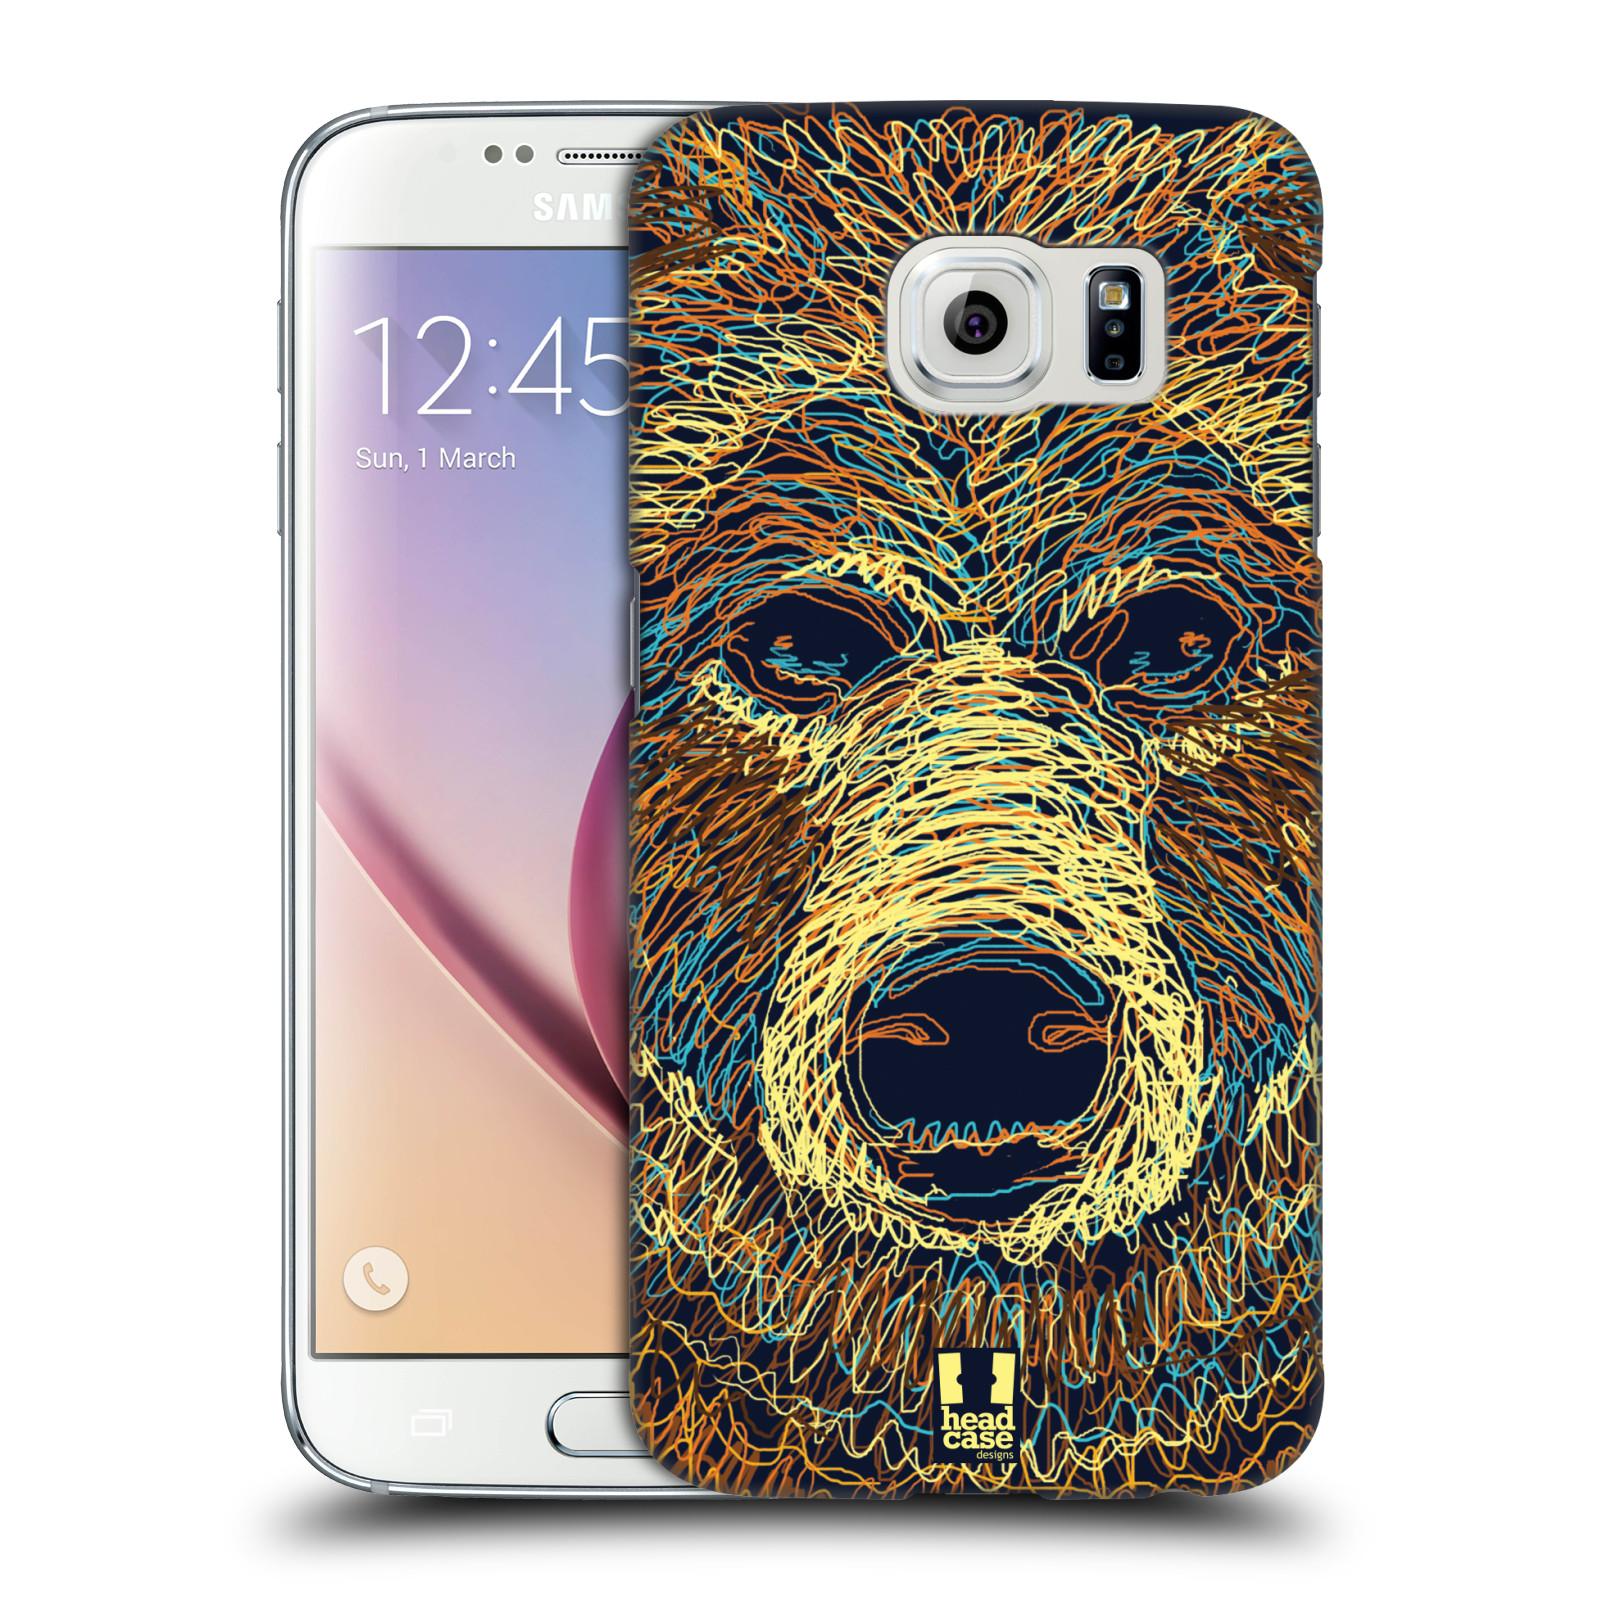 HEAD CASE plastový obal na mobil SAMSUNG Galaxy S6 (G9200, G920F) vzor zvíře čmáranice medvěd